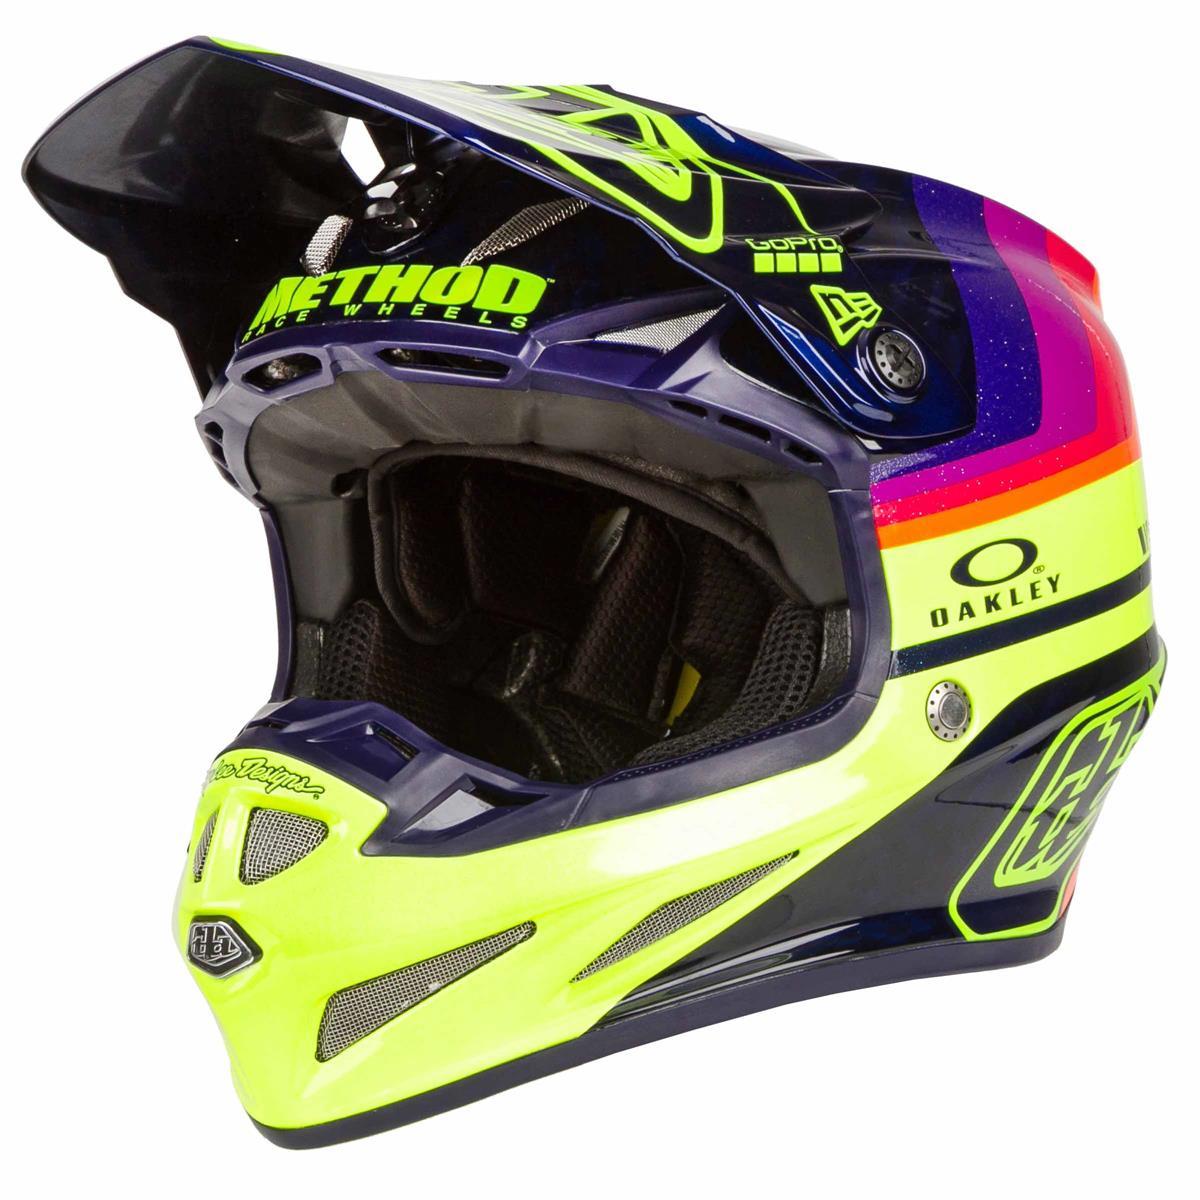 Troy Lee Designs MX Helm SE 4 Vegas Limited Edition - Mirage, Navy/Fluo Gelb